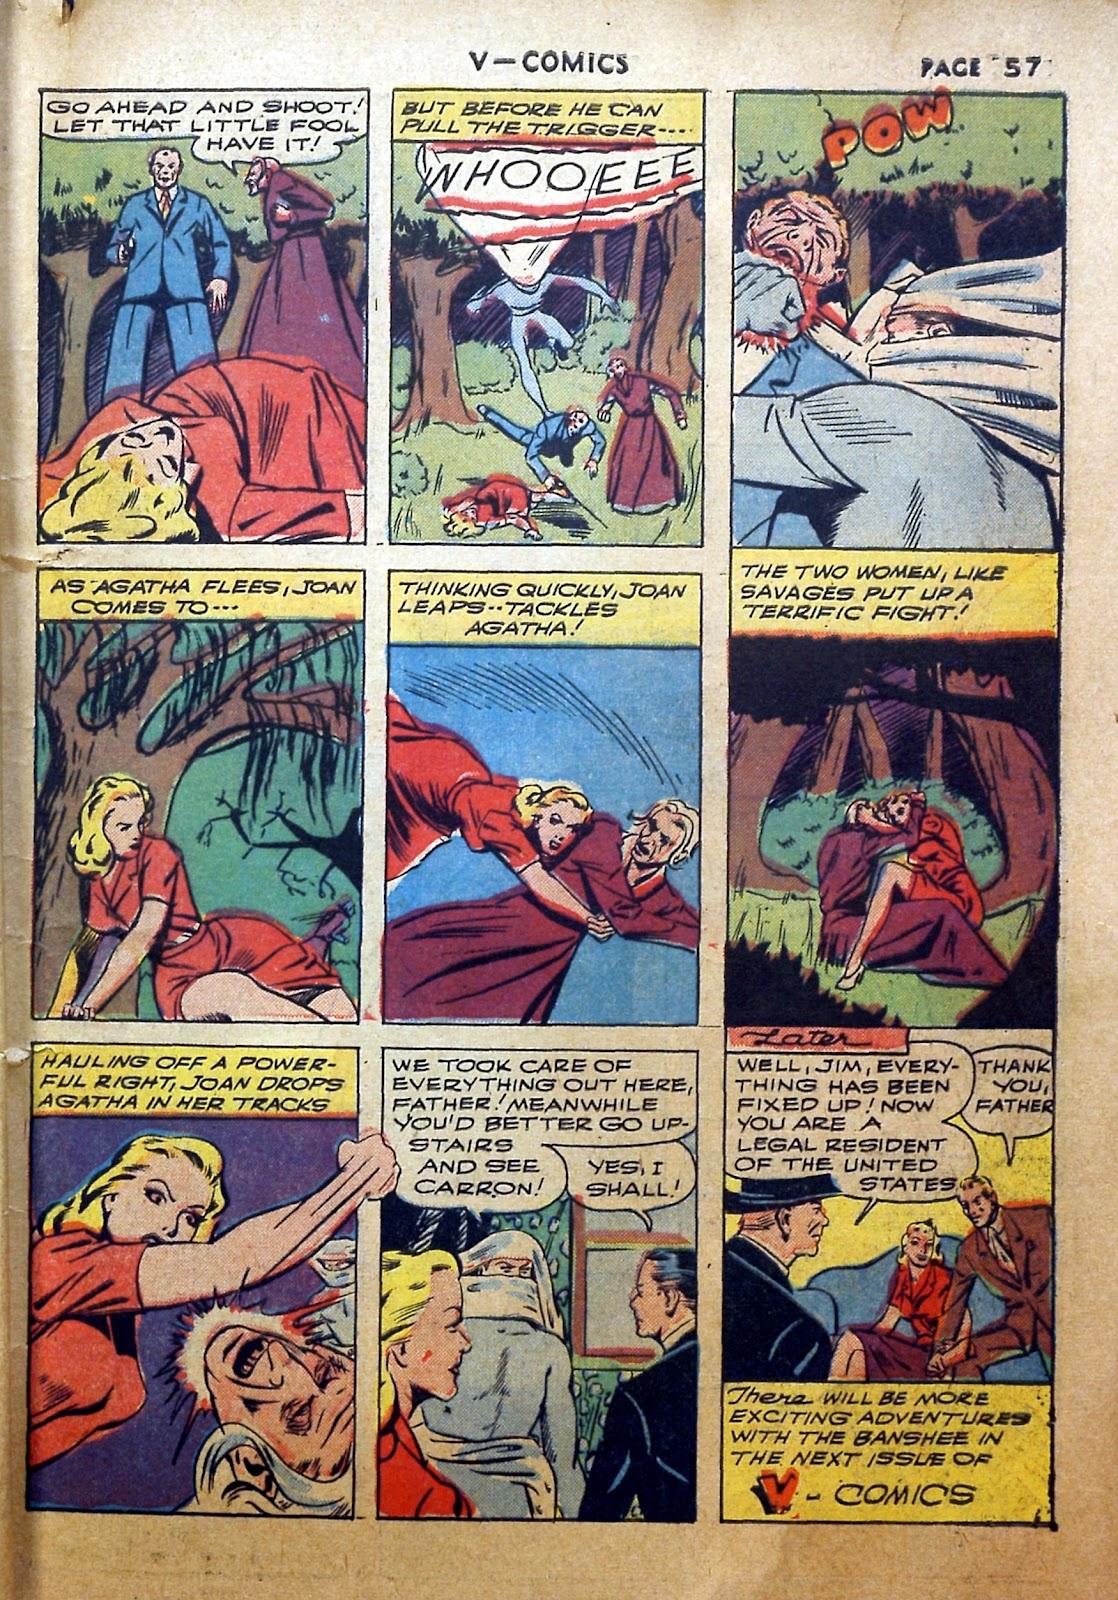 Read online V...- Comics comic -  Issue #2 - 58